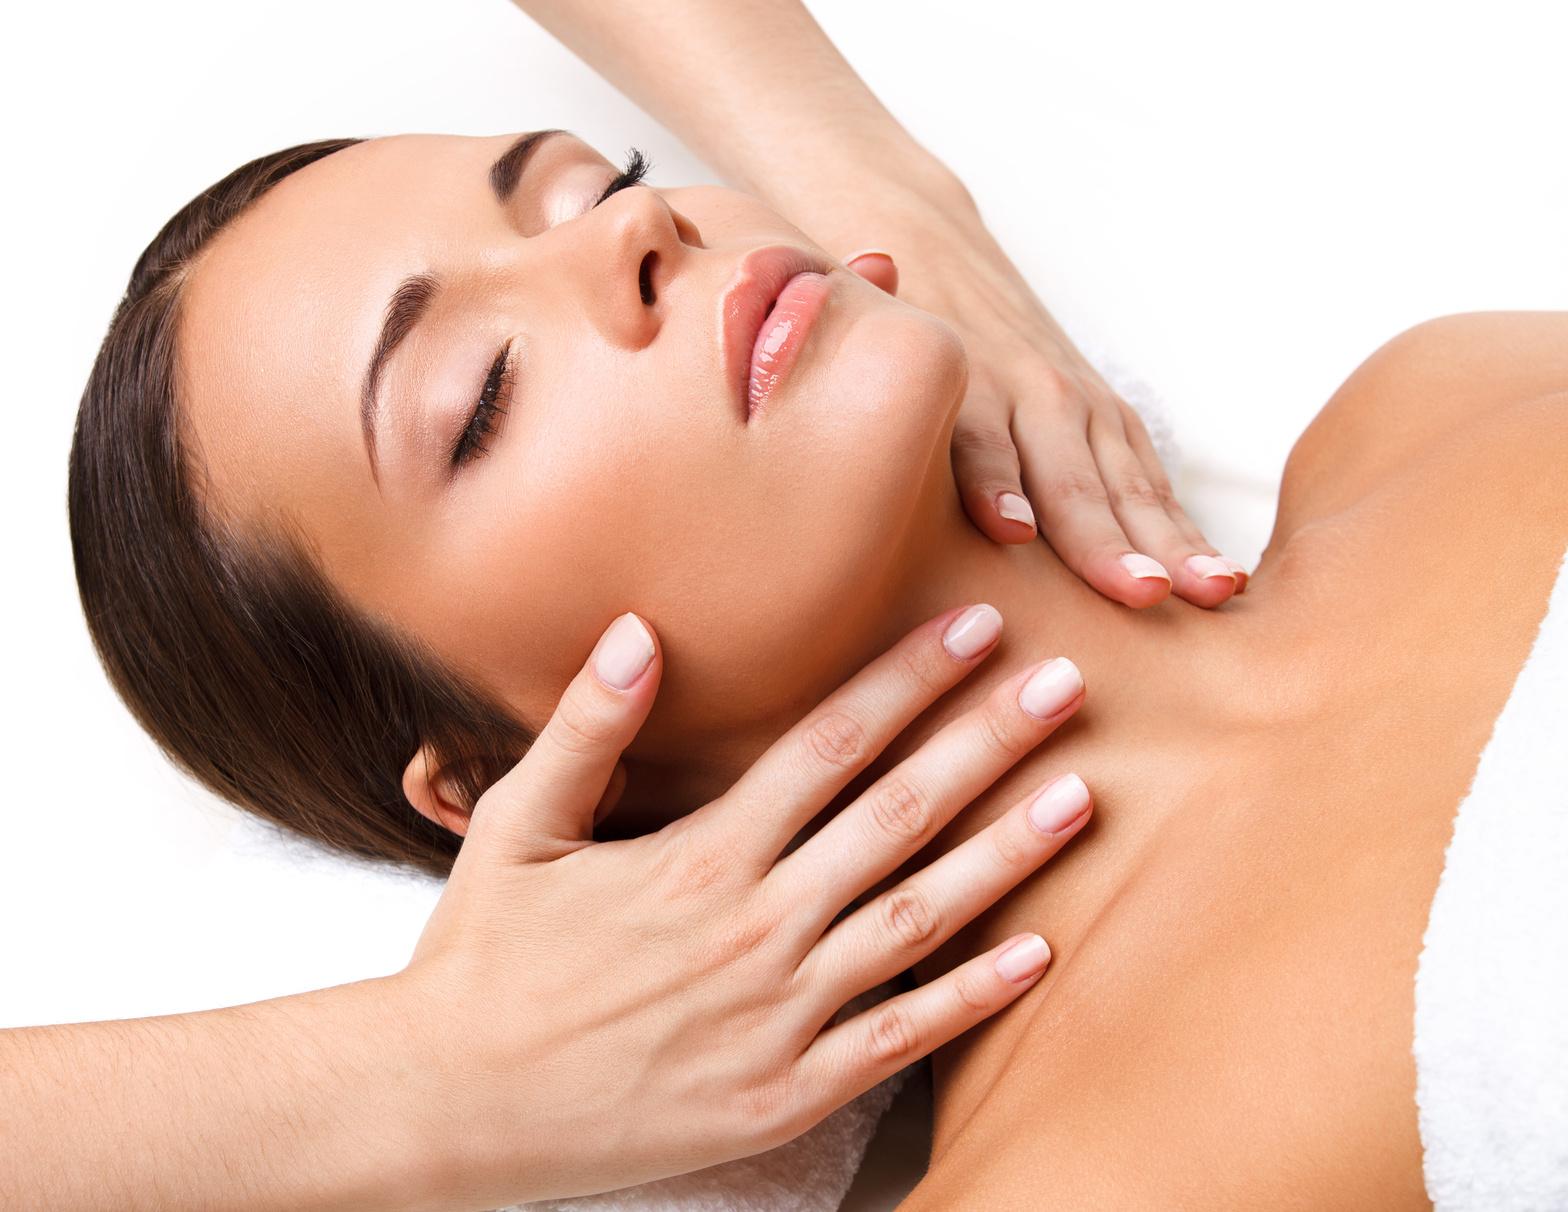 Bonnie & Clyde Kosmetik Massagen